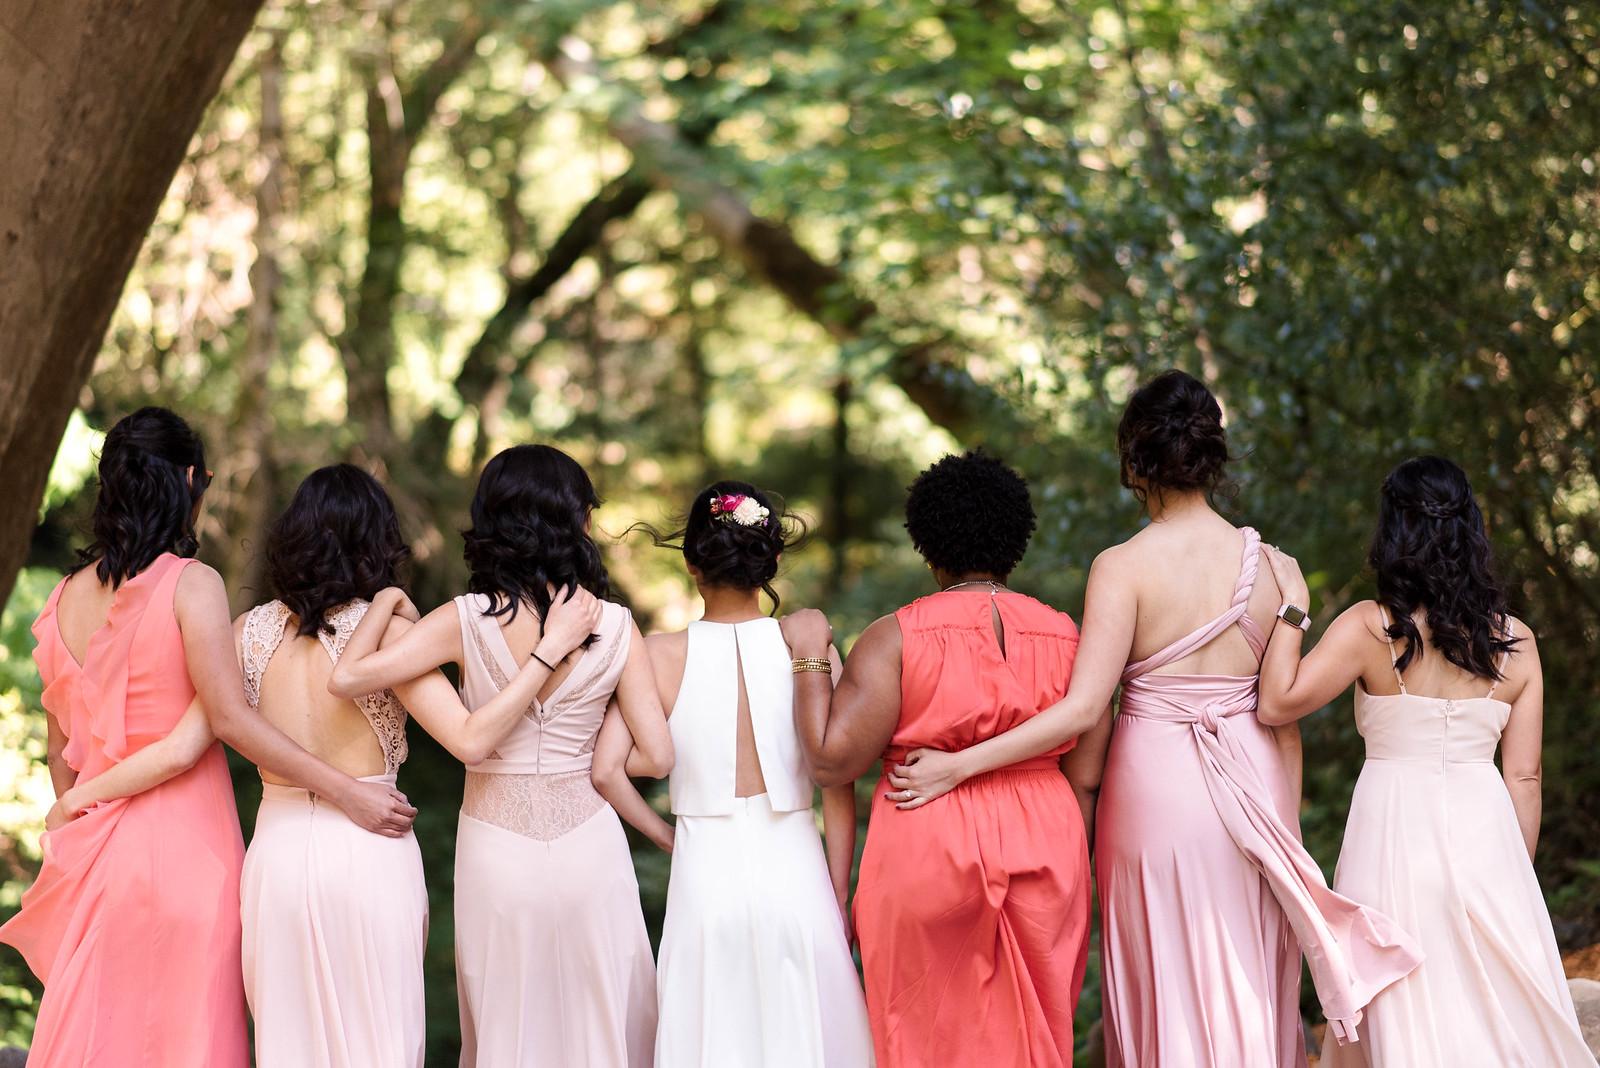 Mismatched Bridesmaids on juliettelaura.com